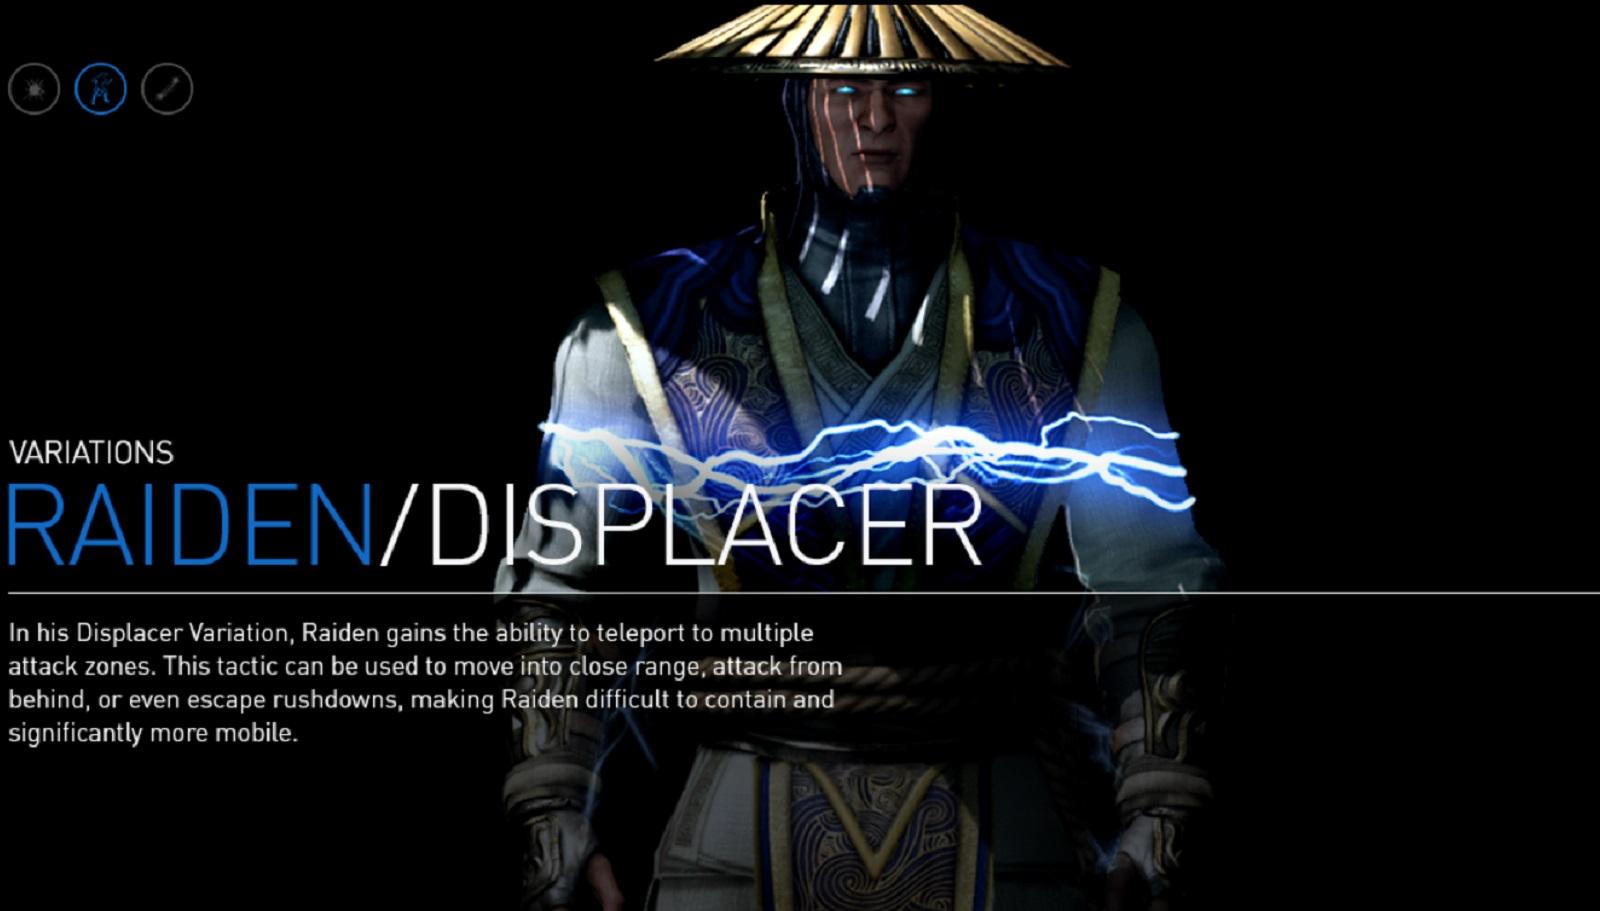 Mortal Kombat X Raiden Displacer Variation Character Artwork